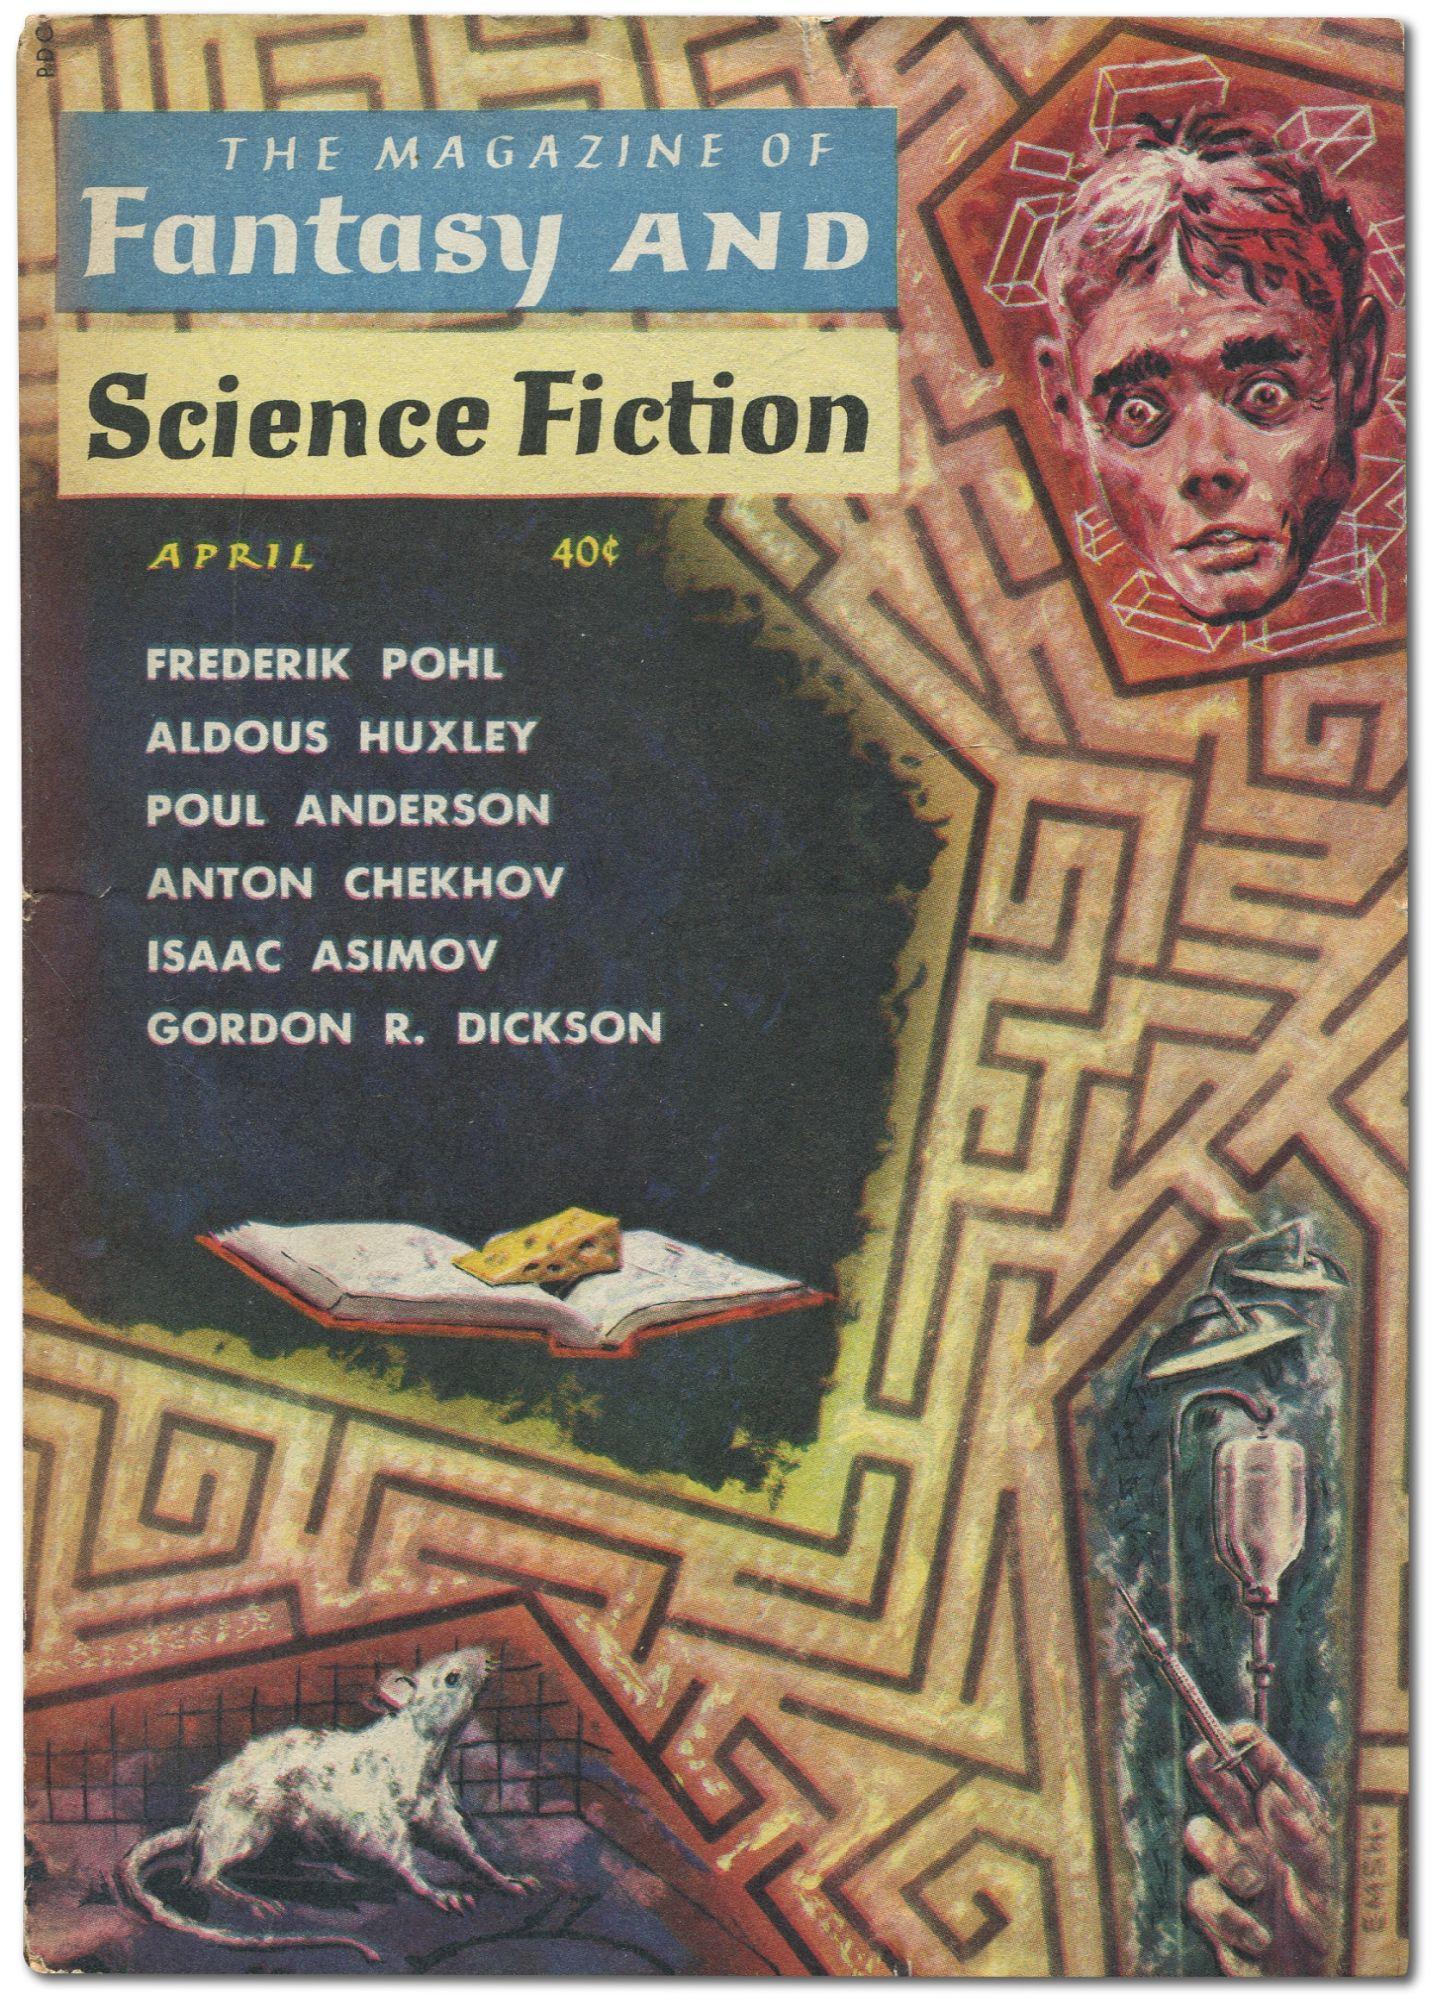 Flowers For Algernon Story In The Magazine Of Fantasy